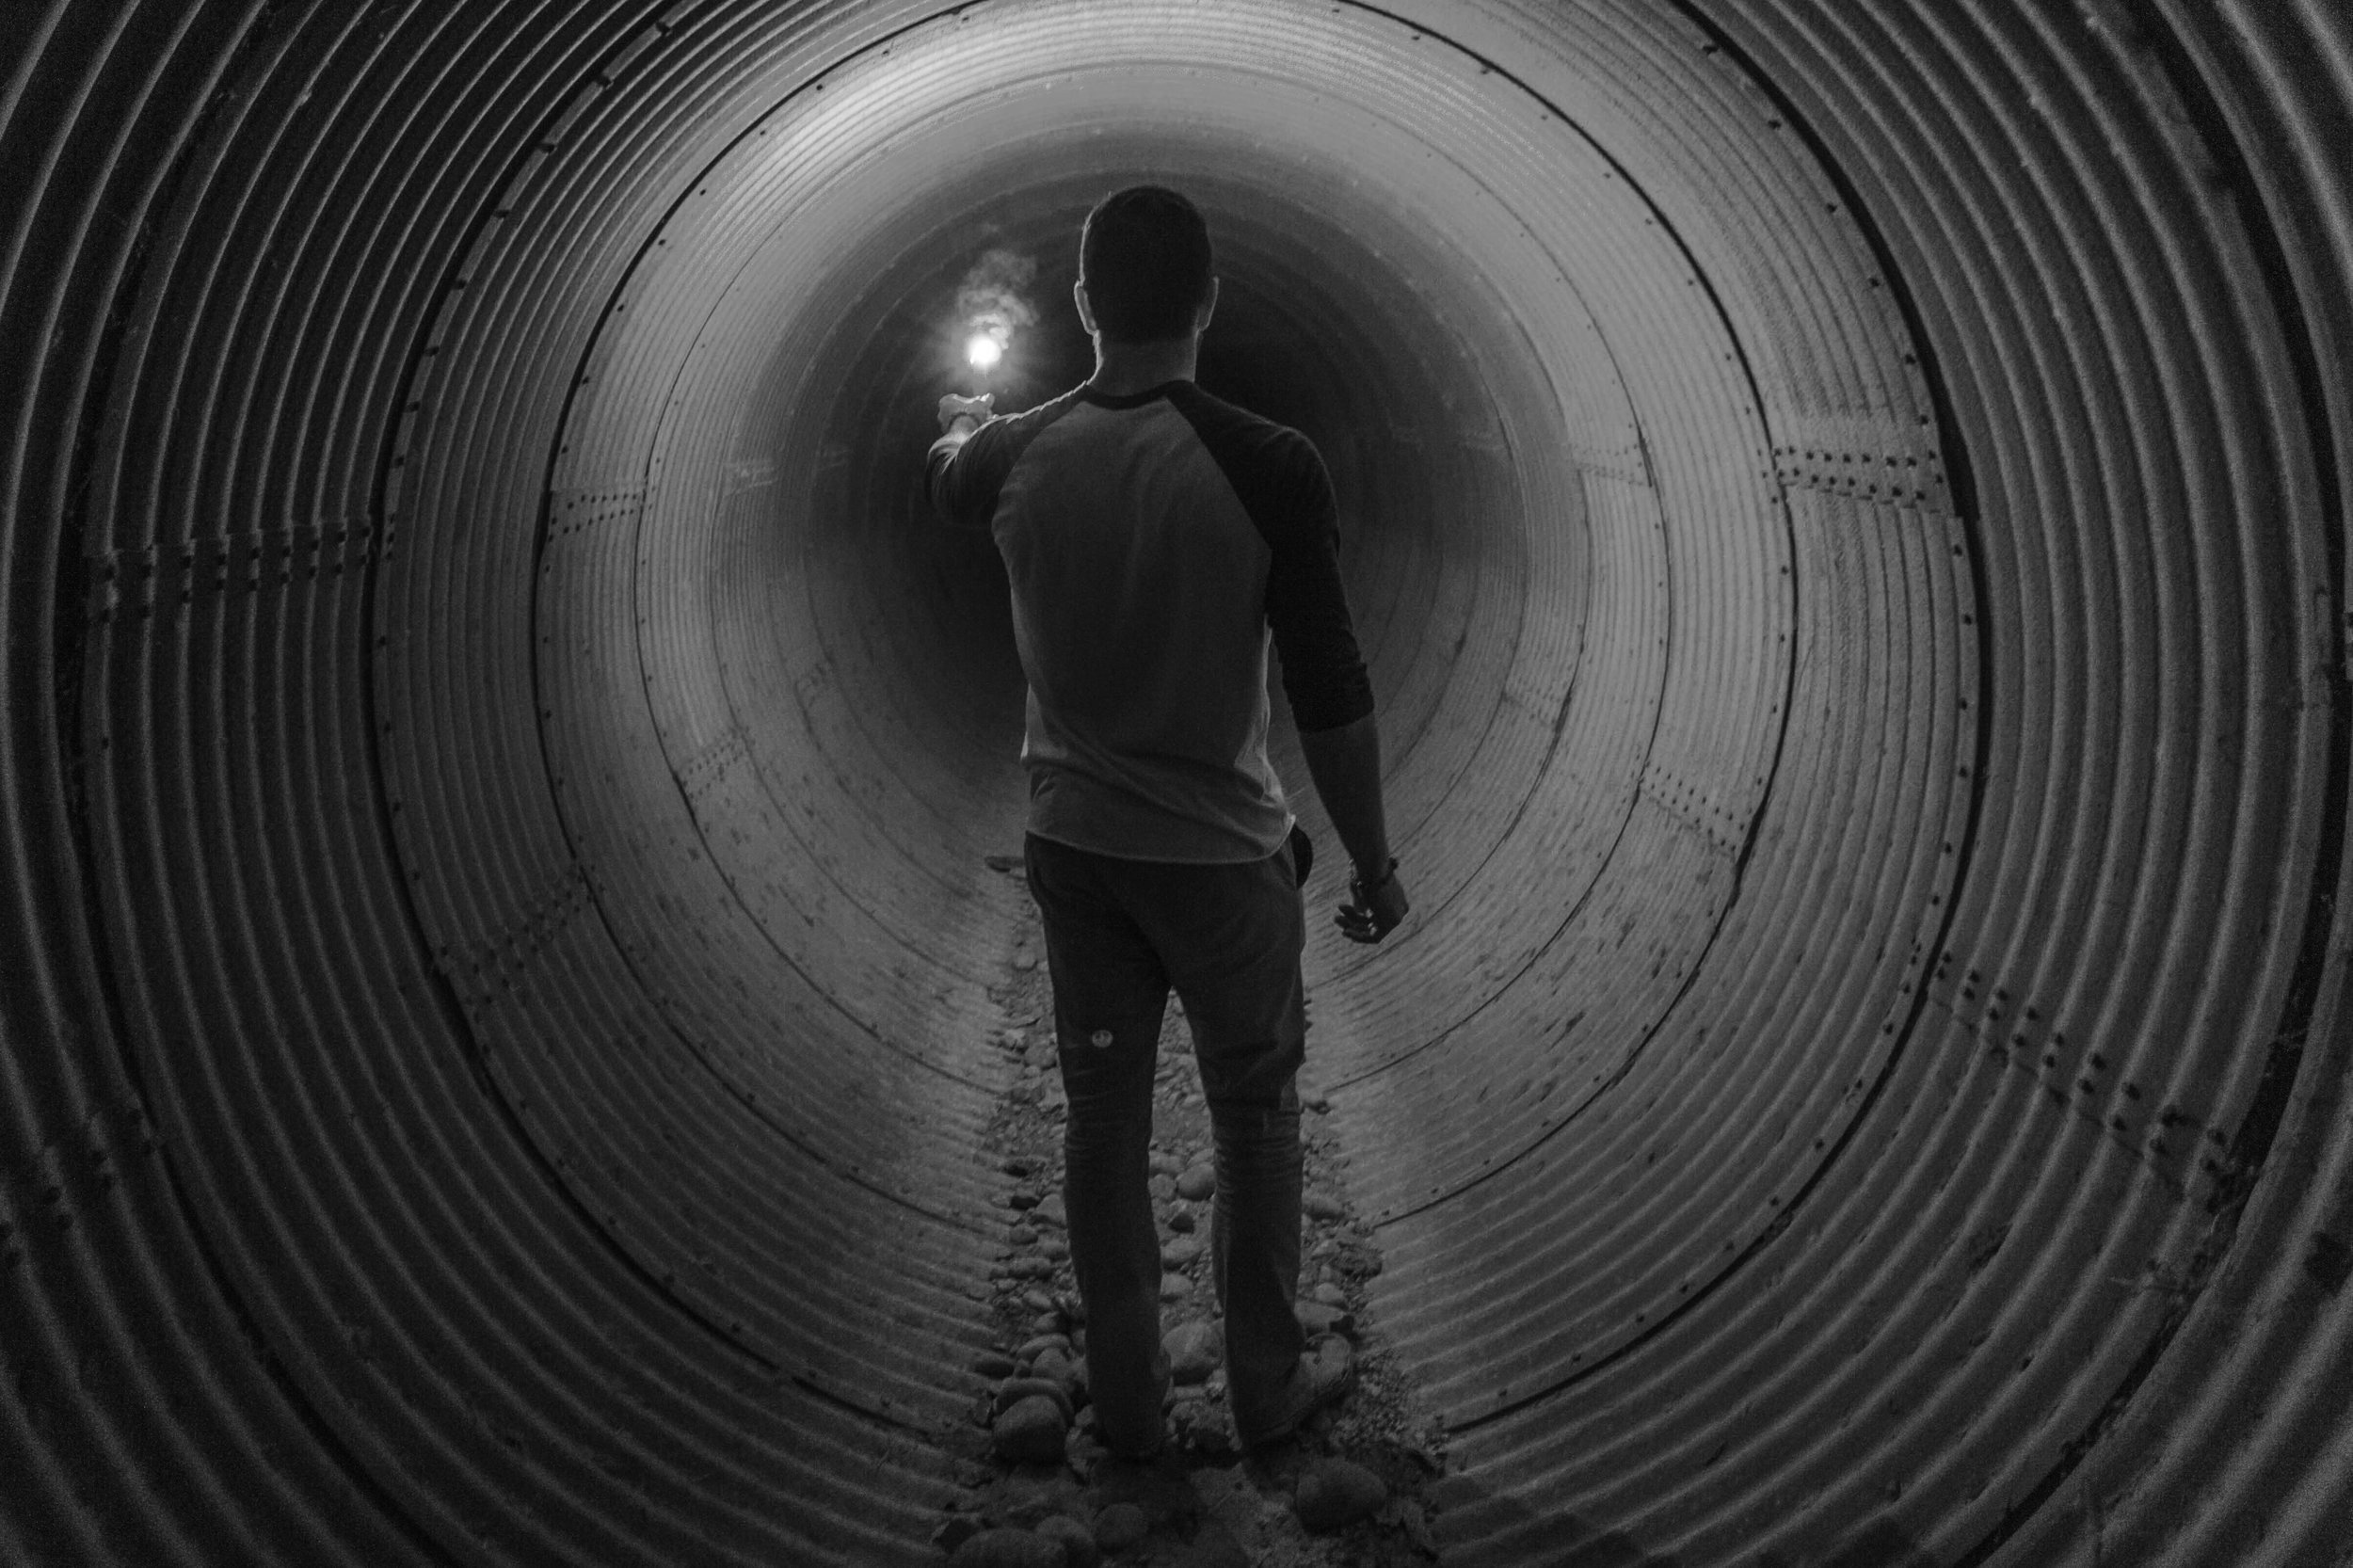 bigdecisions-professionaldecisions-crossroads-gainingperspective.jpg